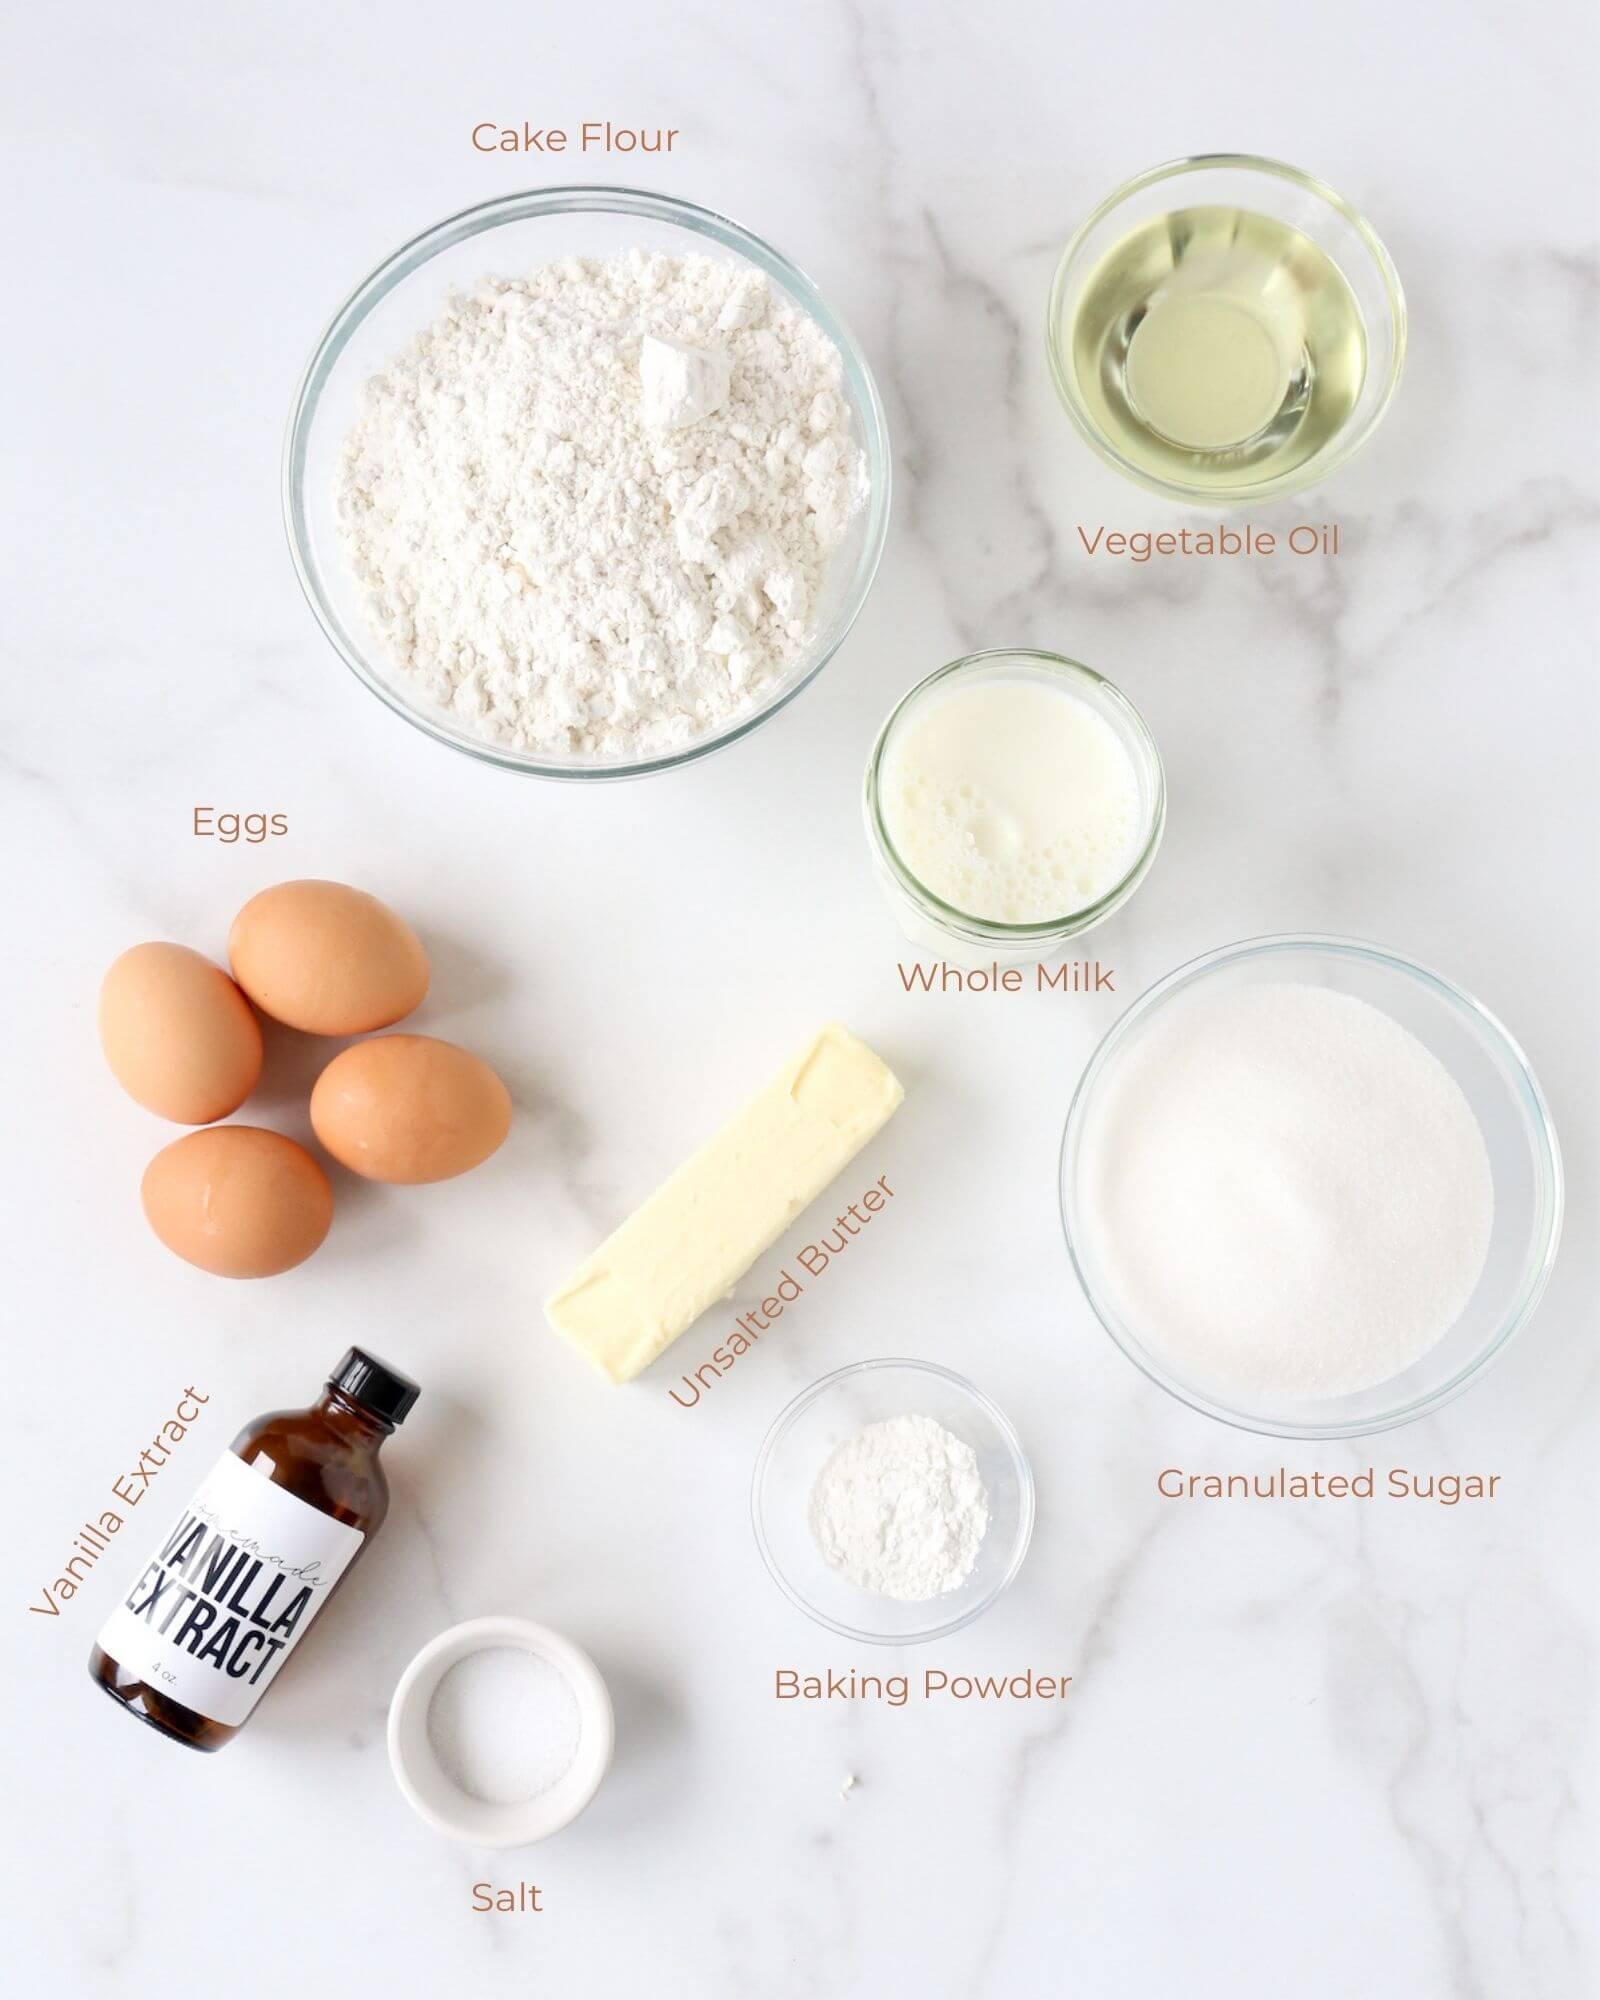 small bowls of flour, oil, milk, sugar, baking powder, salt, eggs and butter.